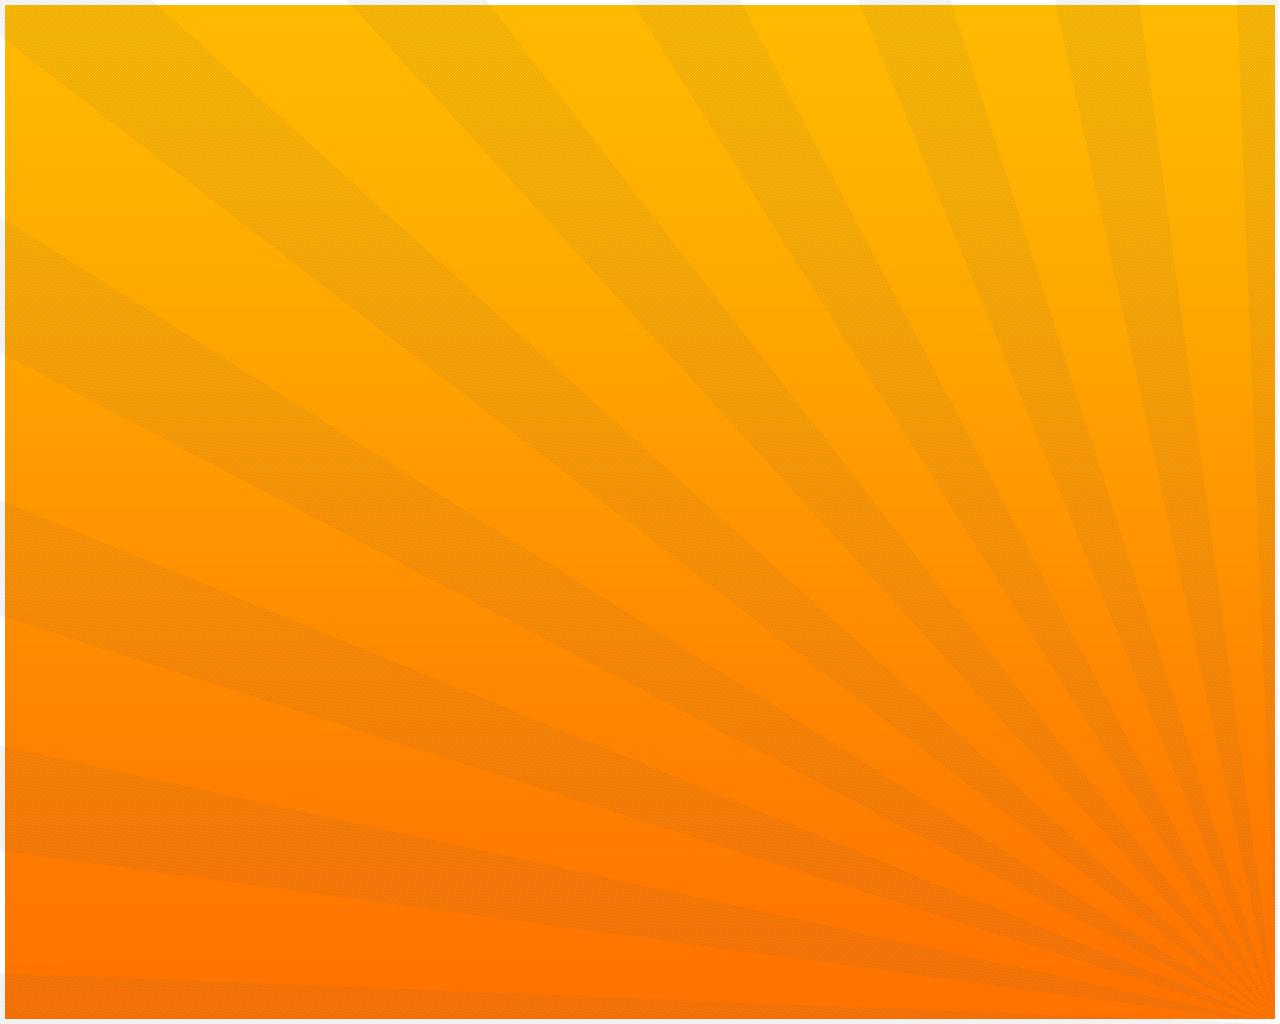 orange wallpaper06 - photo #3